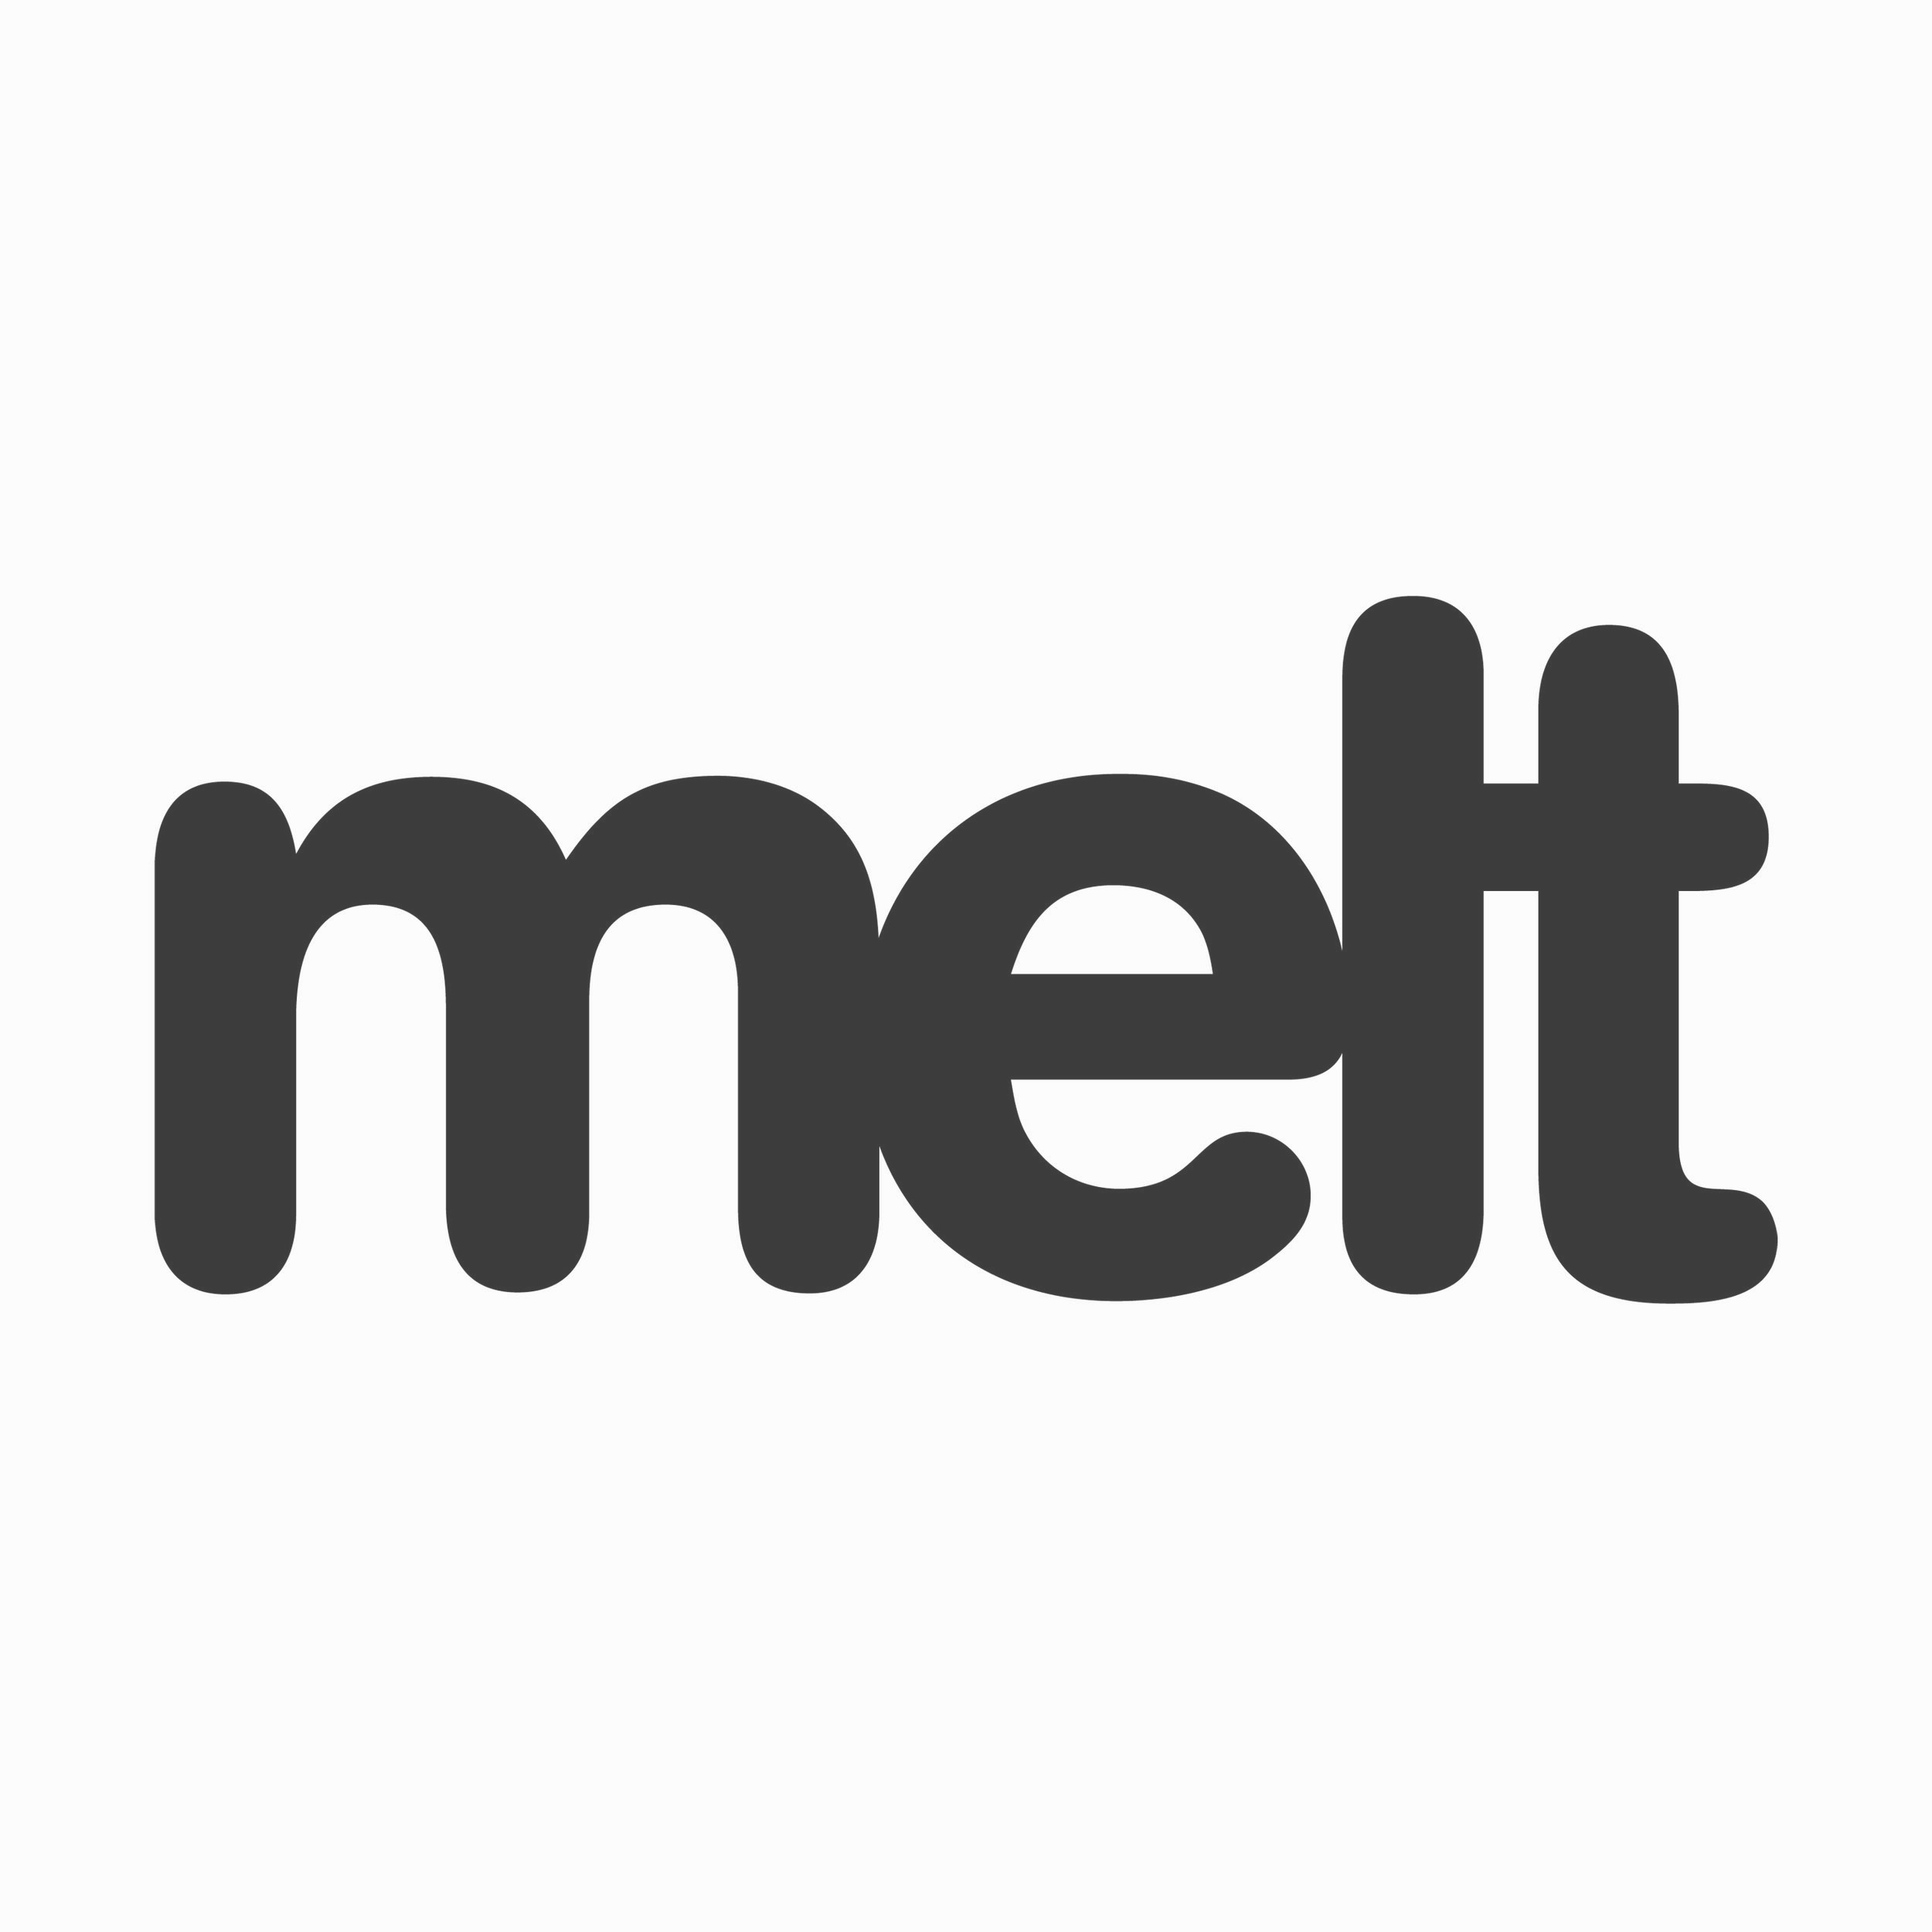 Melt+Logo+Artwork+Magenta+square.jpg